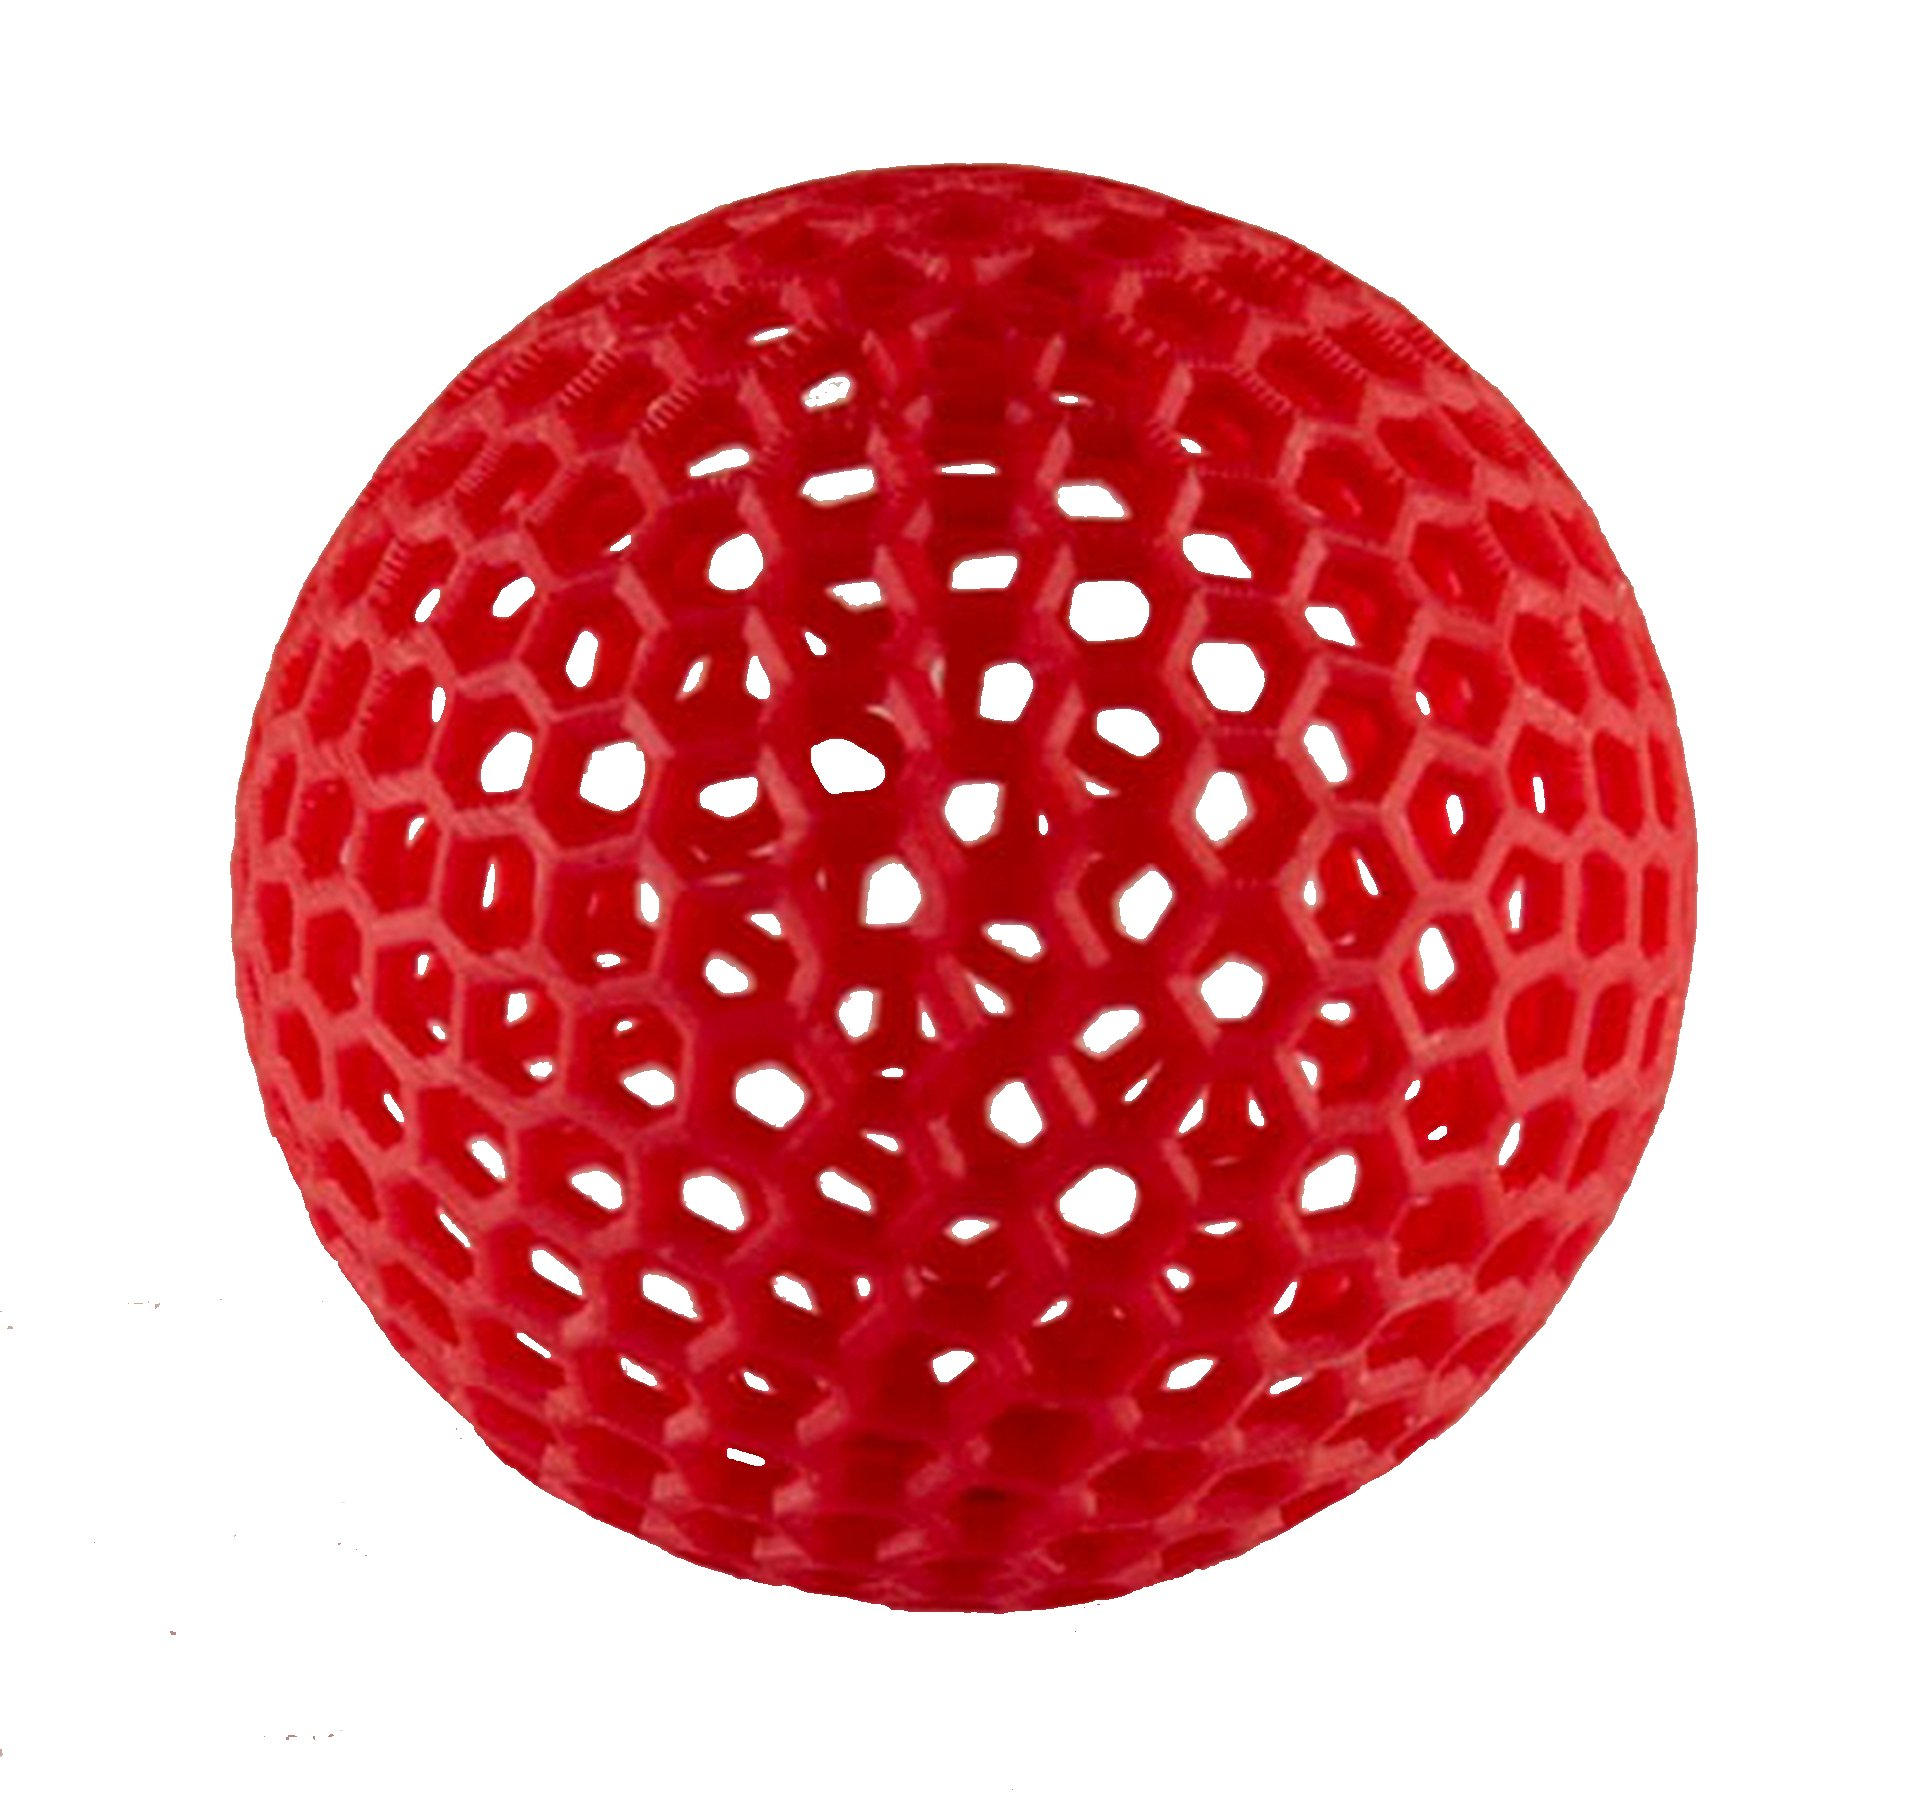 MakerJuice Red G+ UV 3D Plastic Printing Resin for SLA and DLP Printers (one 500 mL bottle).